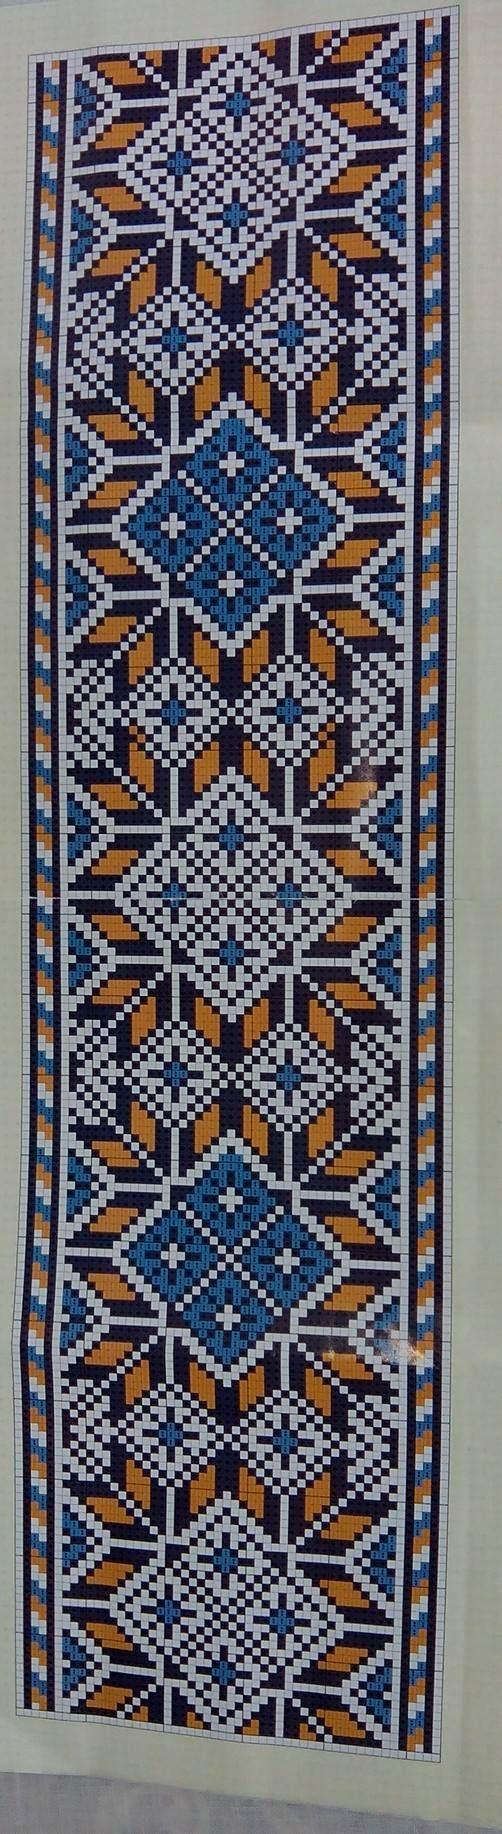 Ukrainian design